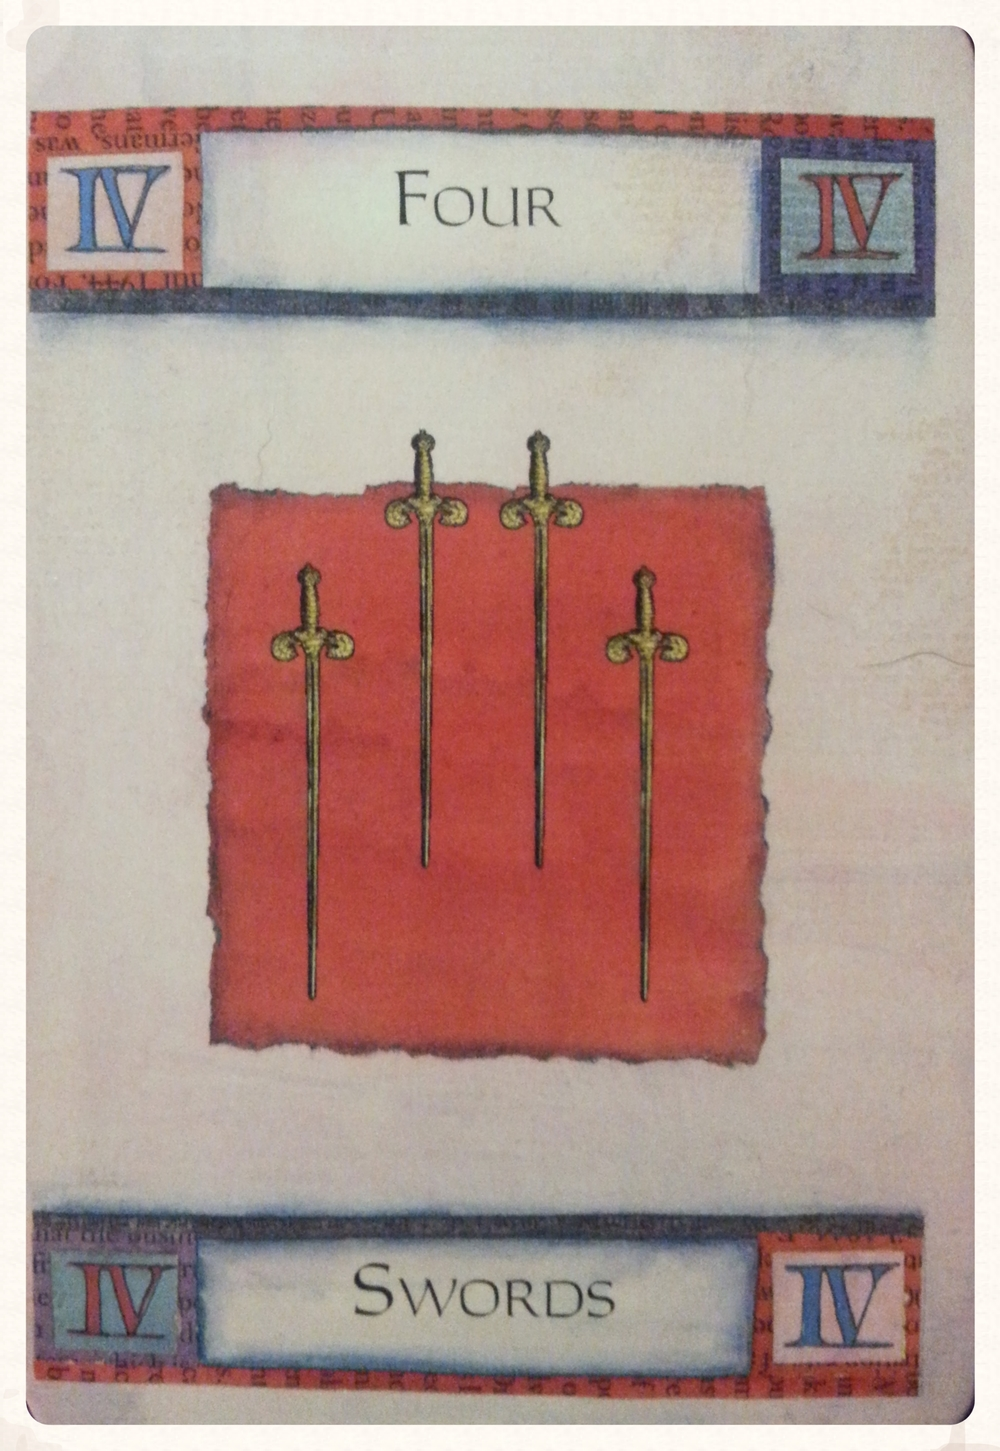 -THOR'S DAY SEPTEMBER 24TH 2015-   - MINOR ARCANA - FOUR OF SWORDS -